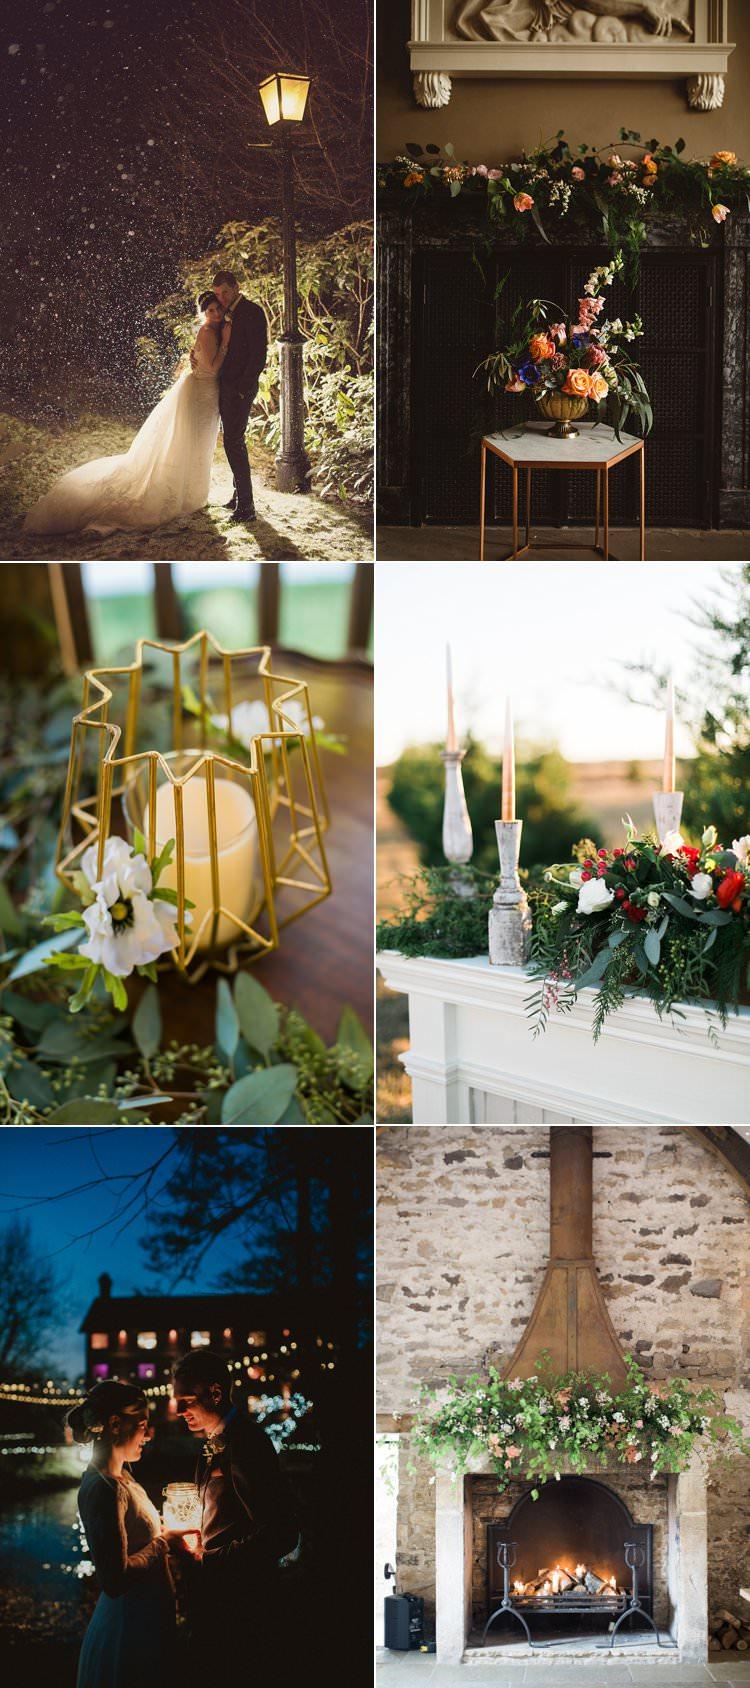 Christmas Winter Wedding Ideas Snow Fireplace Decor